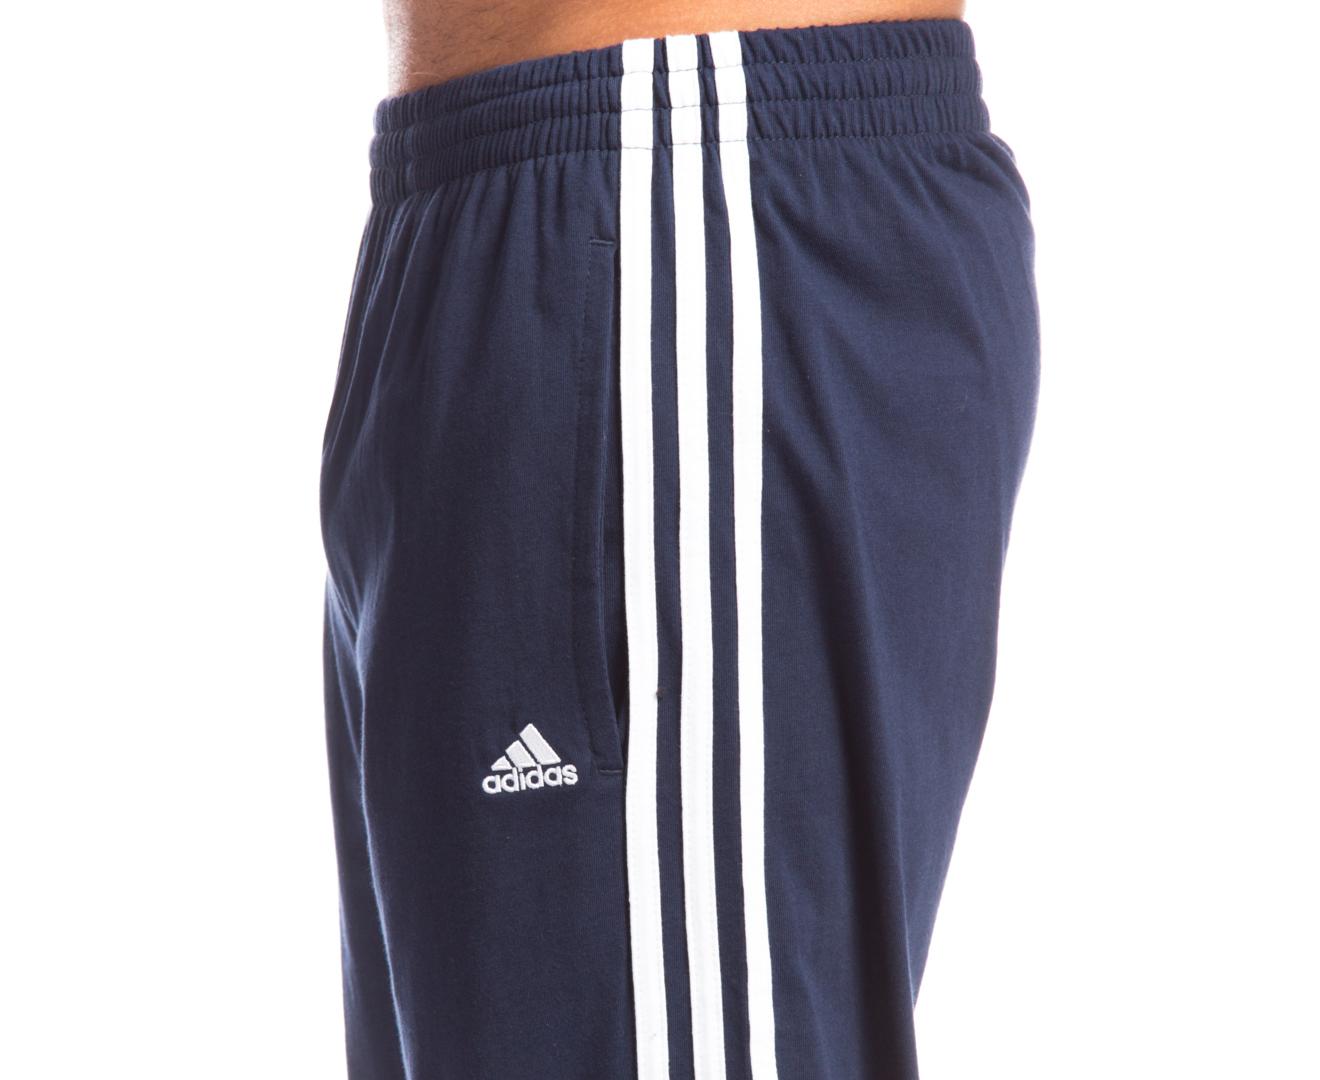 Ugg Bedroom Slippers Adidas Men S 3 Stripe Jersey Pants Navy White Great